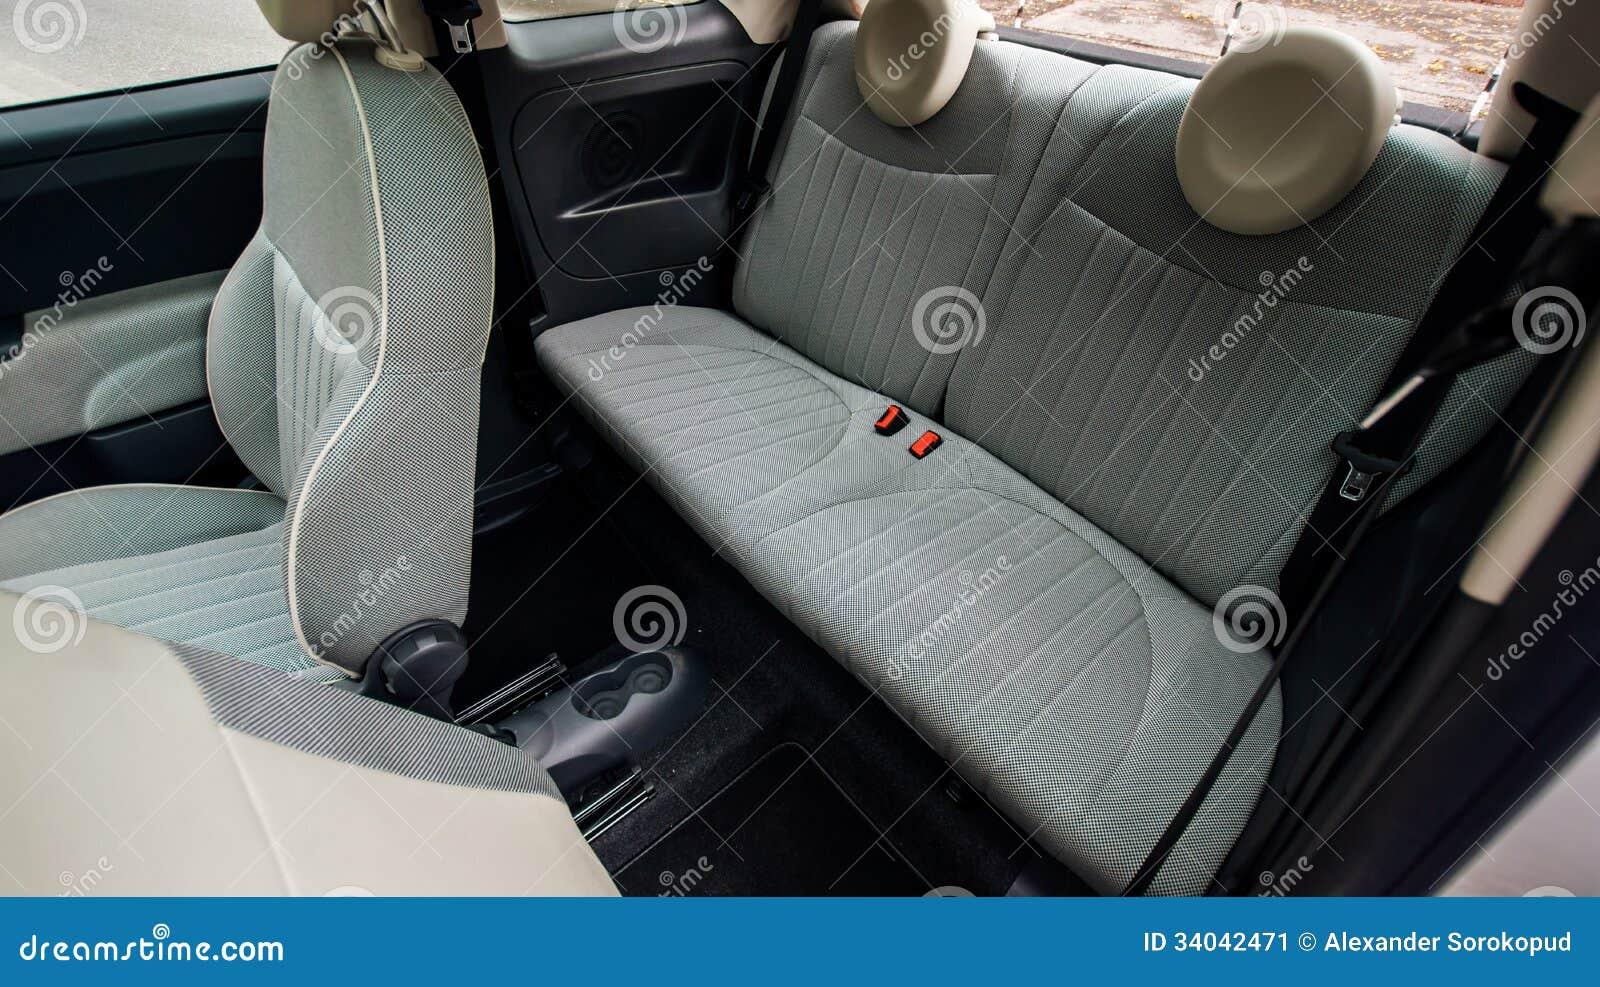 small car interior stock image image 34042471. Black Bedroom Furniture Sets. Home Design Ideas